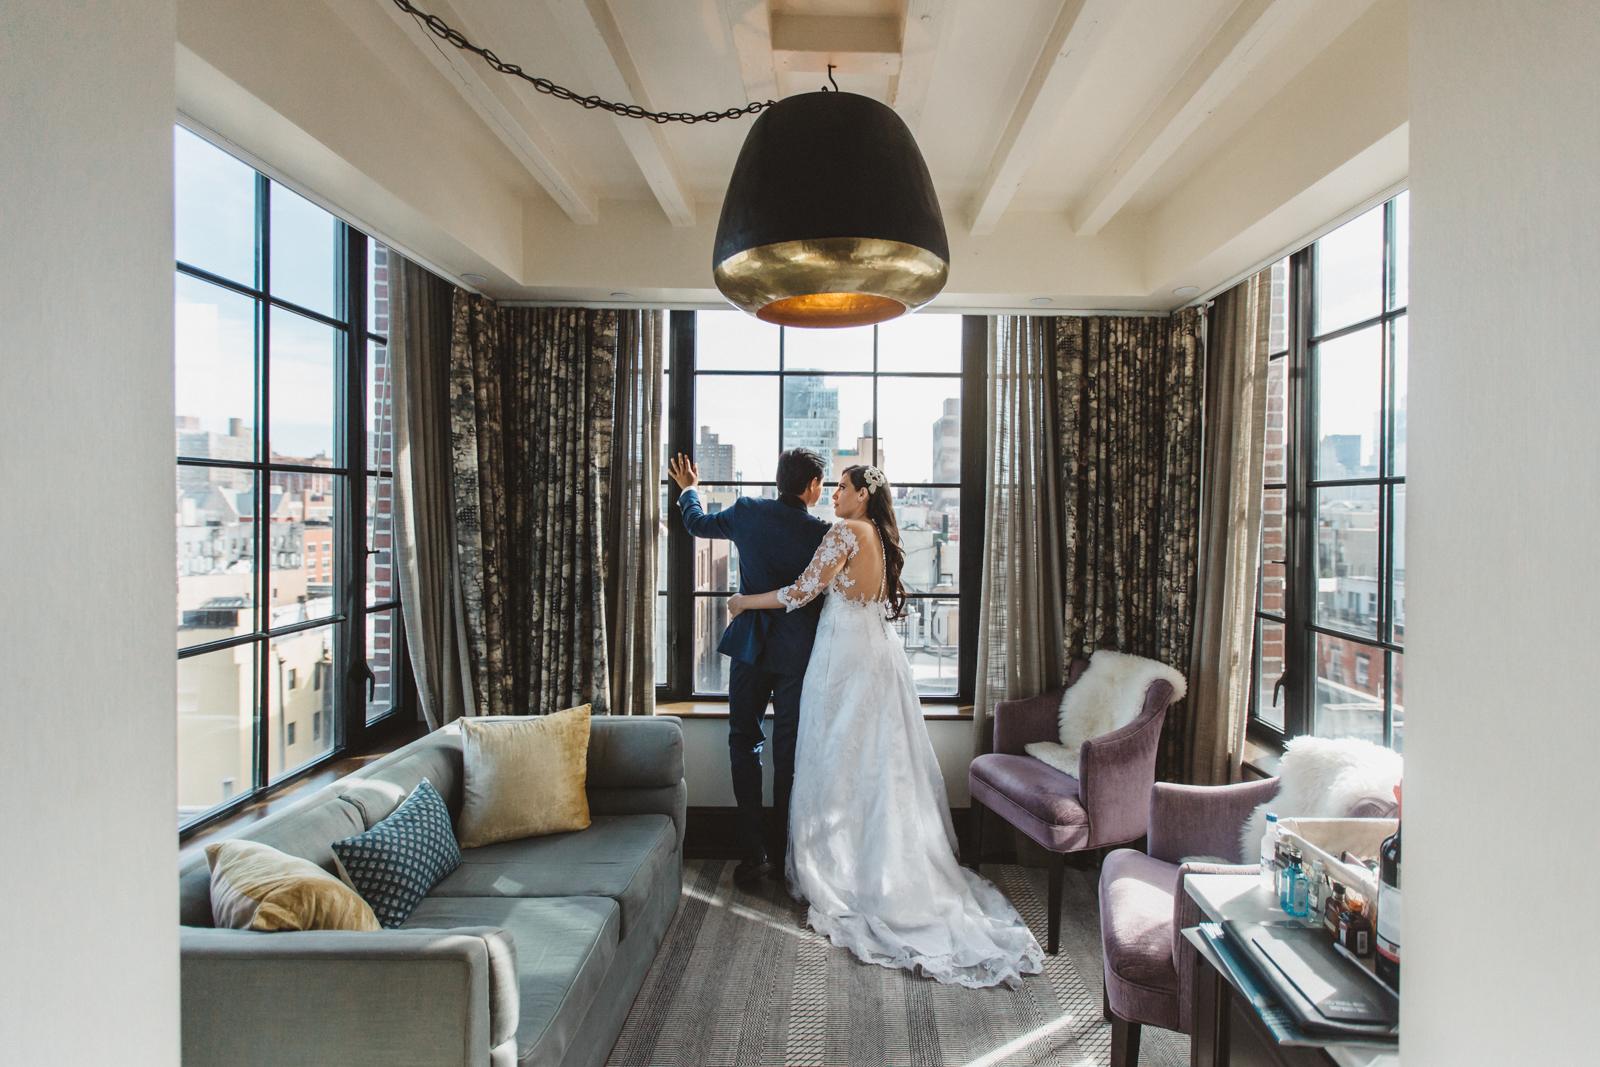 NYC Wedding Photography Lofts at Prince Brooklyn NYC Photographer Boris Zaretsky _B2C5334-Edit.jpg